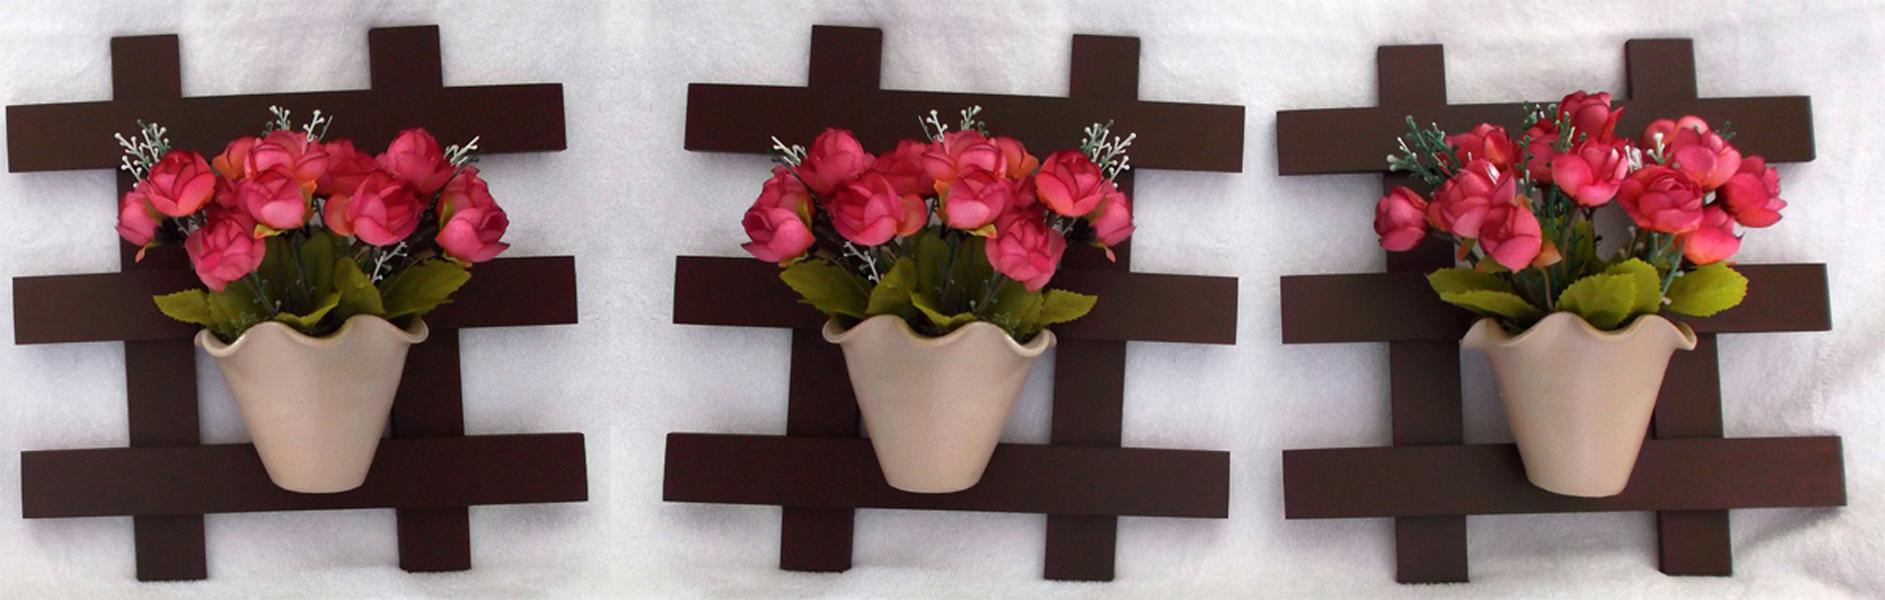 Suficiente Trio de Treliça com Vaso de Flor no Elo7   Toque de Amor Presentes  BA56